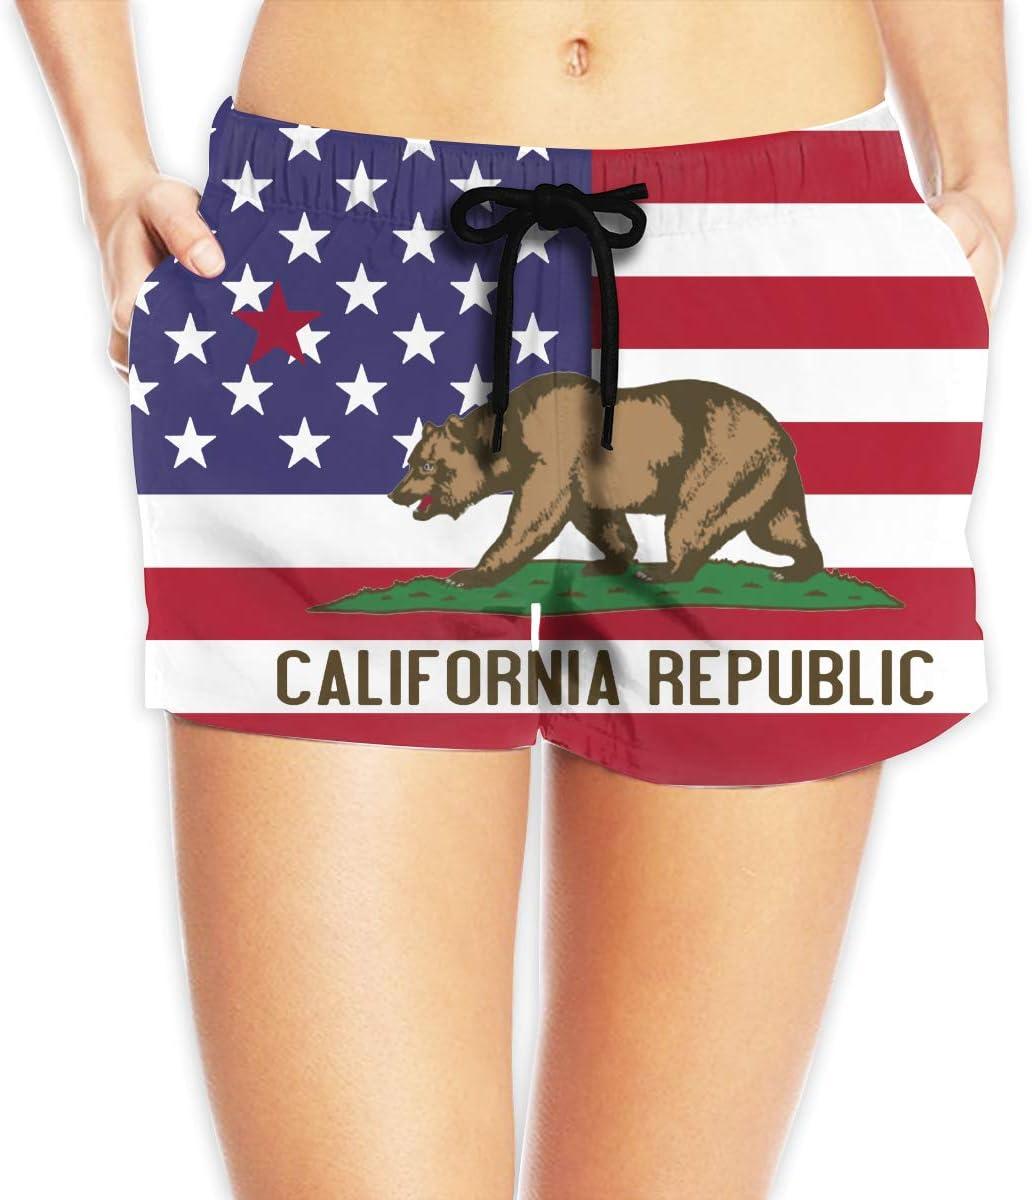 California Flag Women Summer Fashion Beach Board Shorts Quick Dry Yoga Running Swim Trunks with Side Pocket